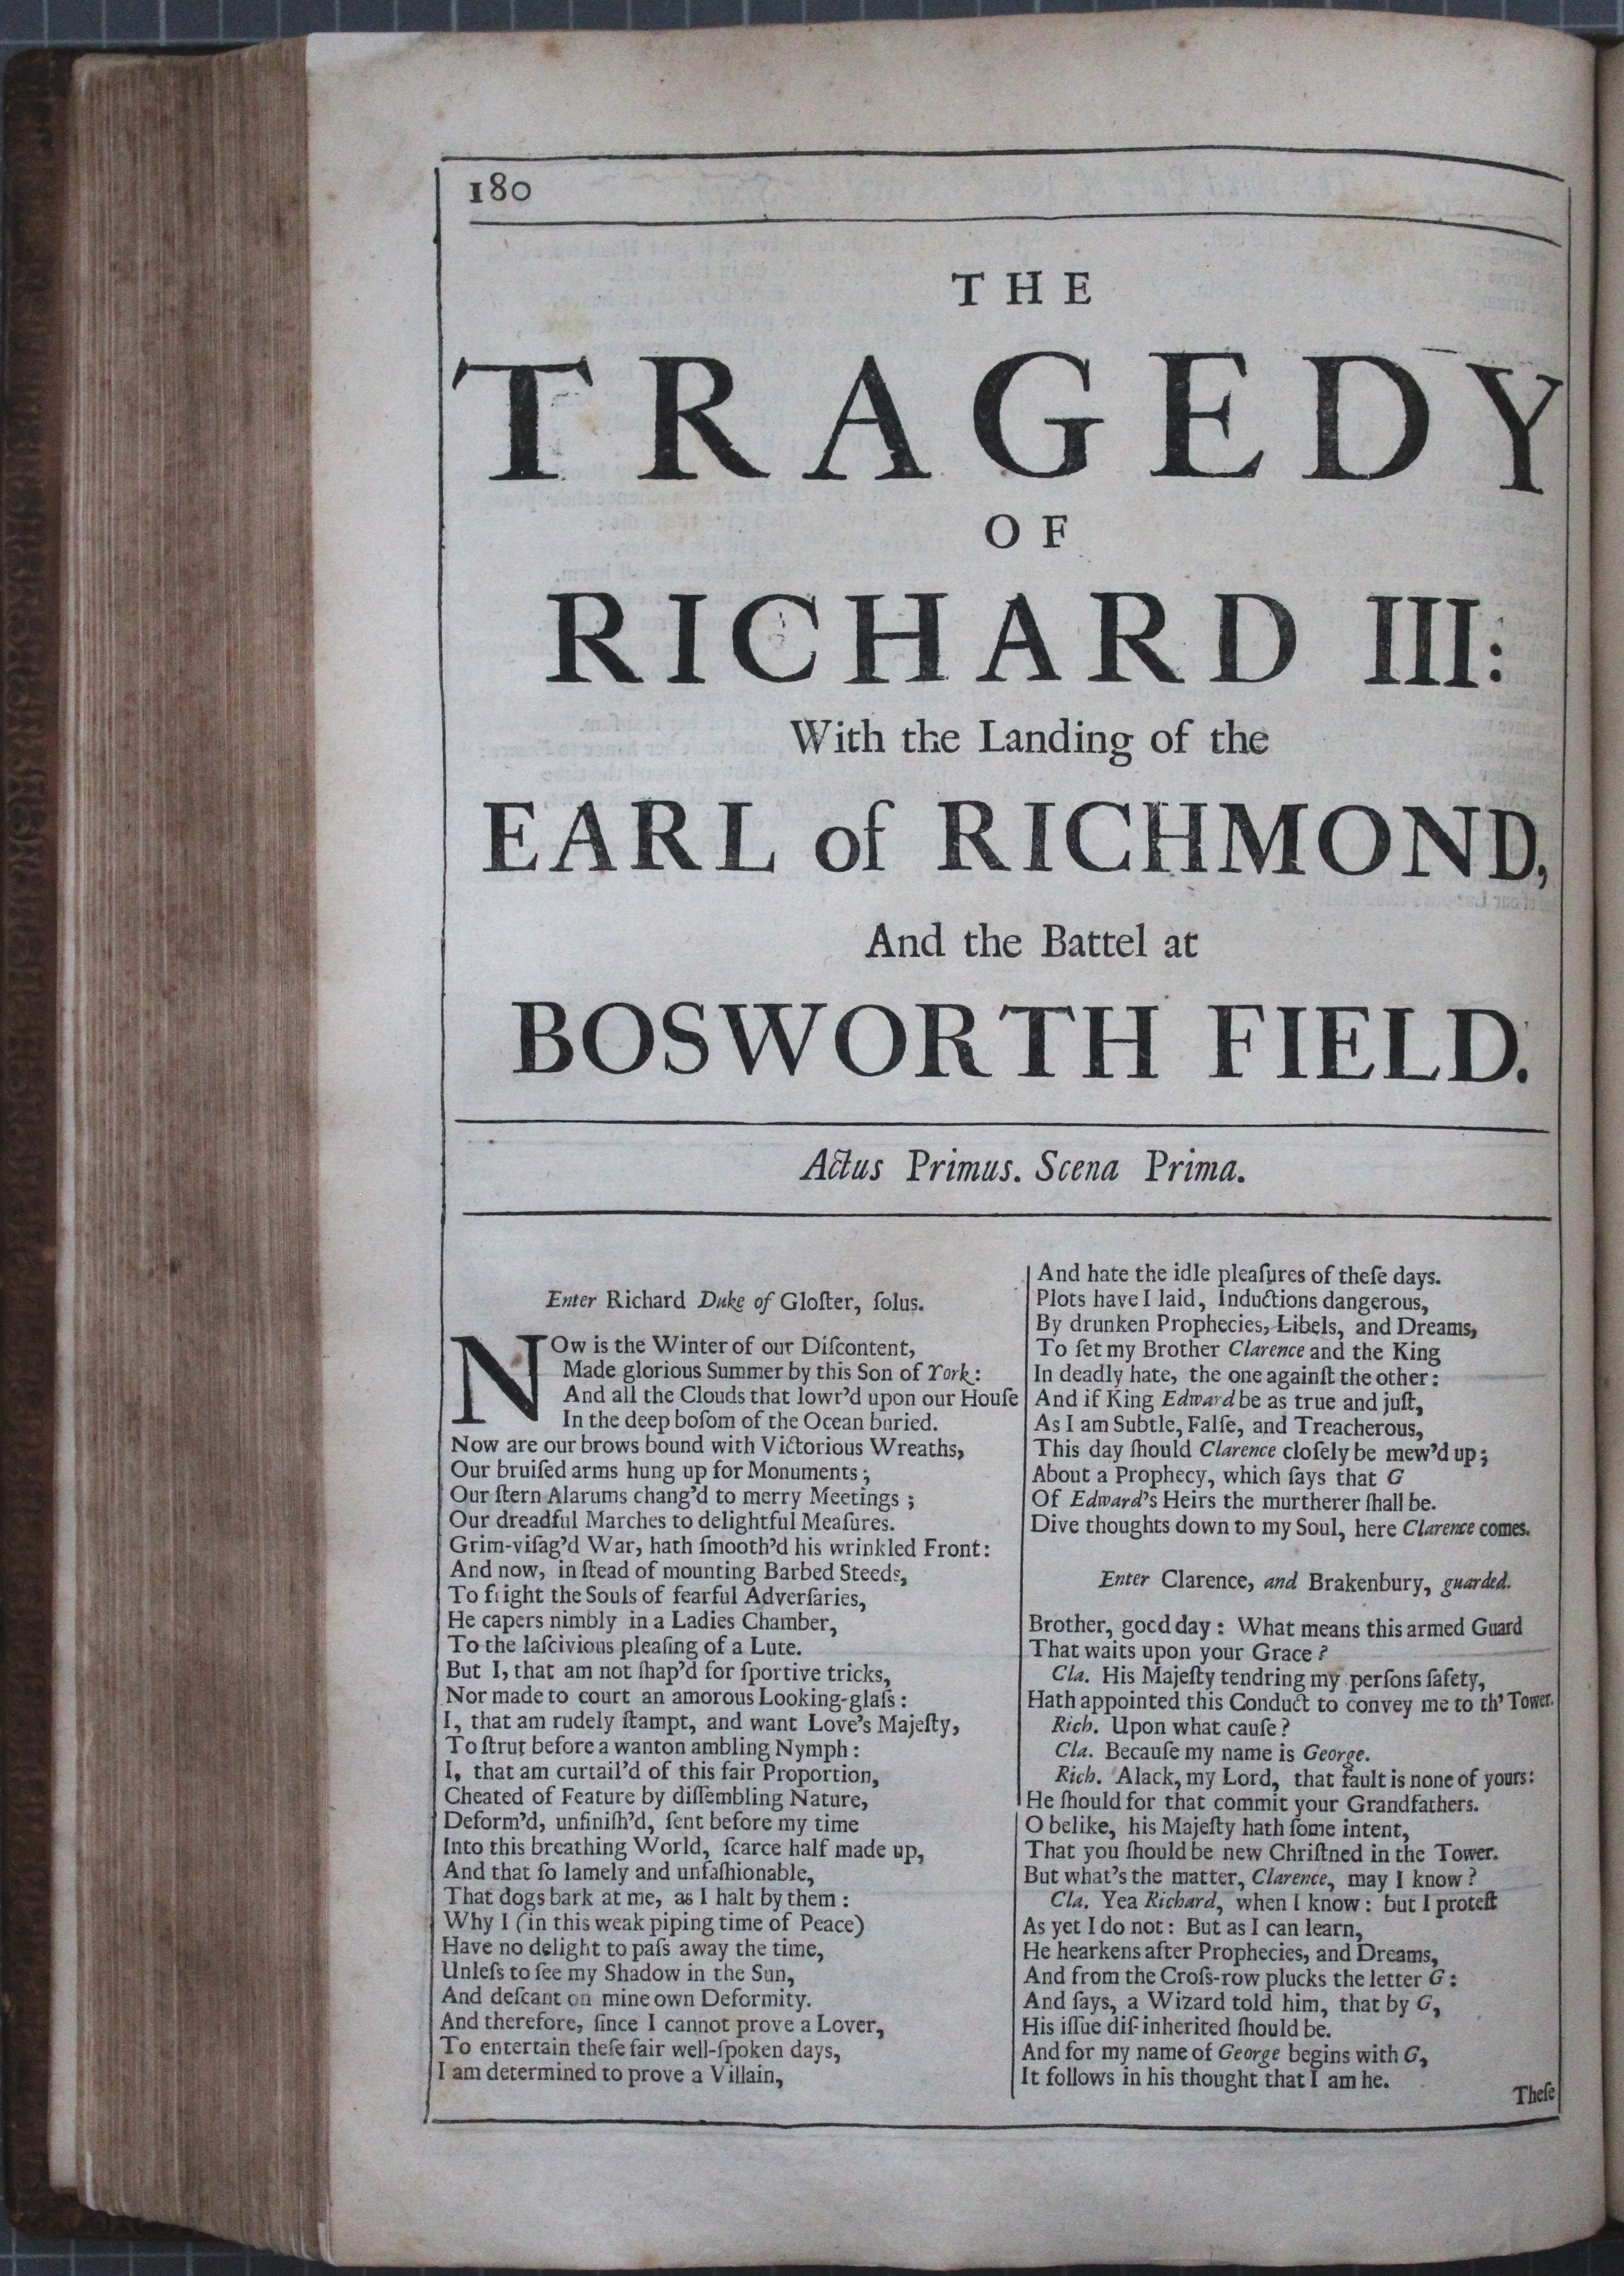 Thackeray.13_Richard III